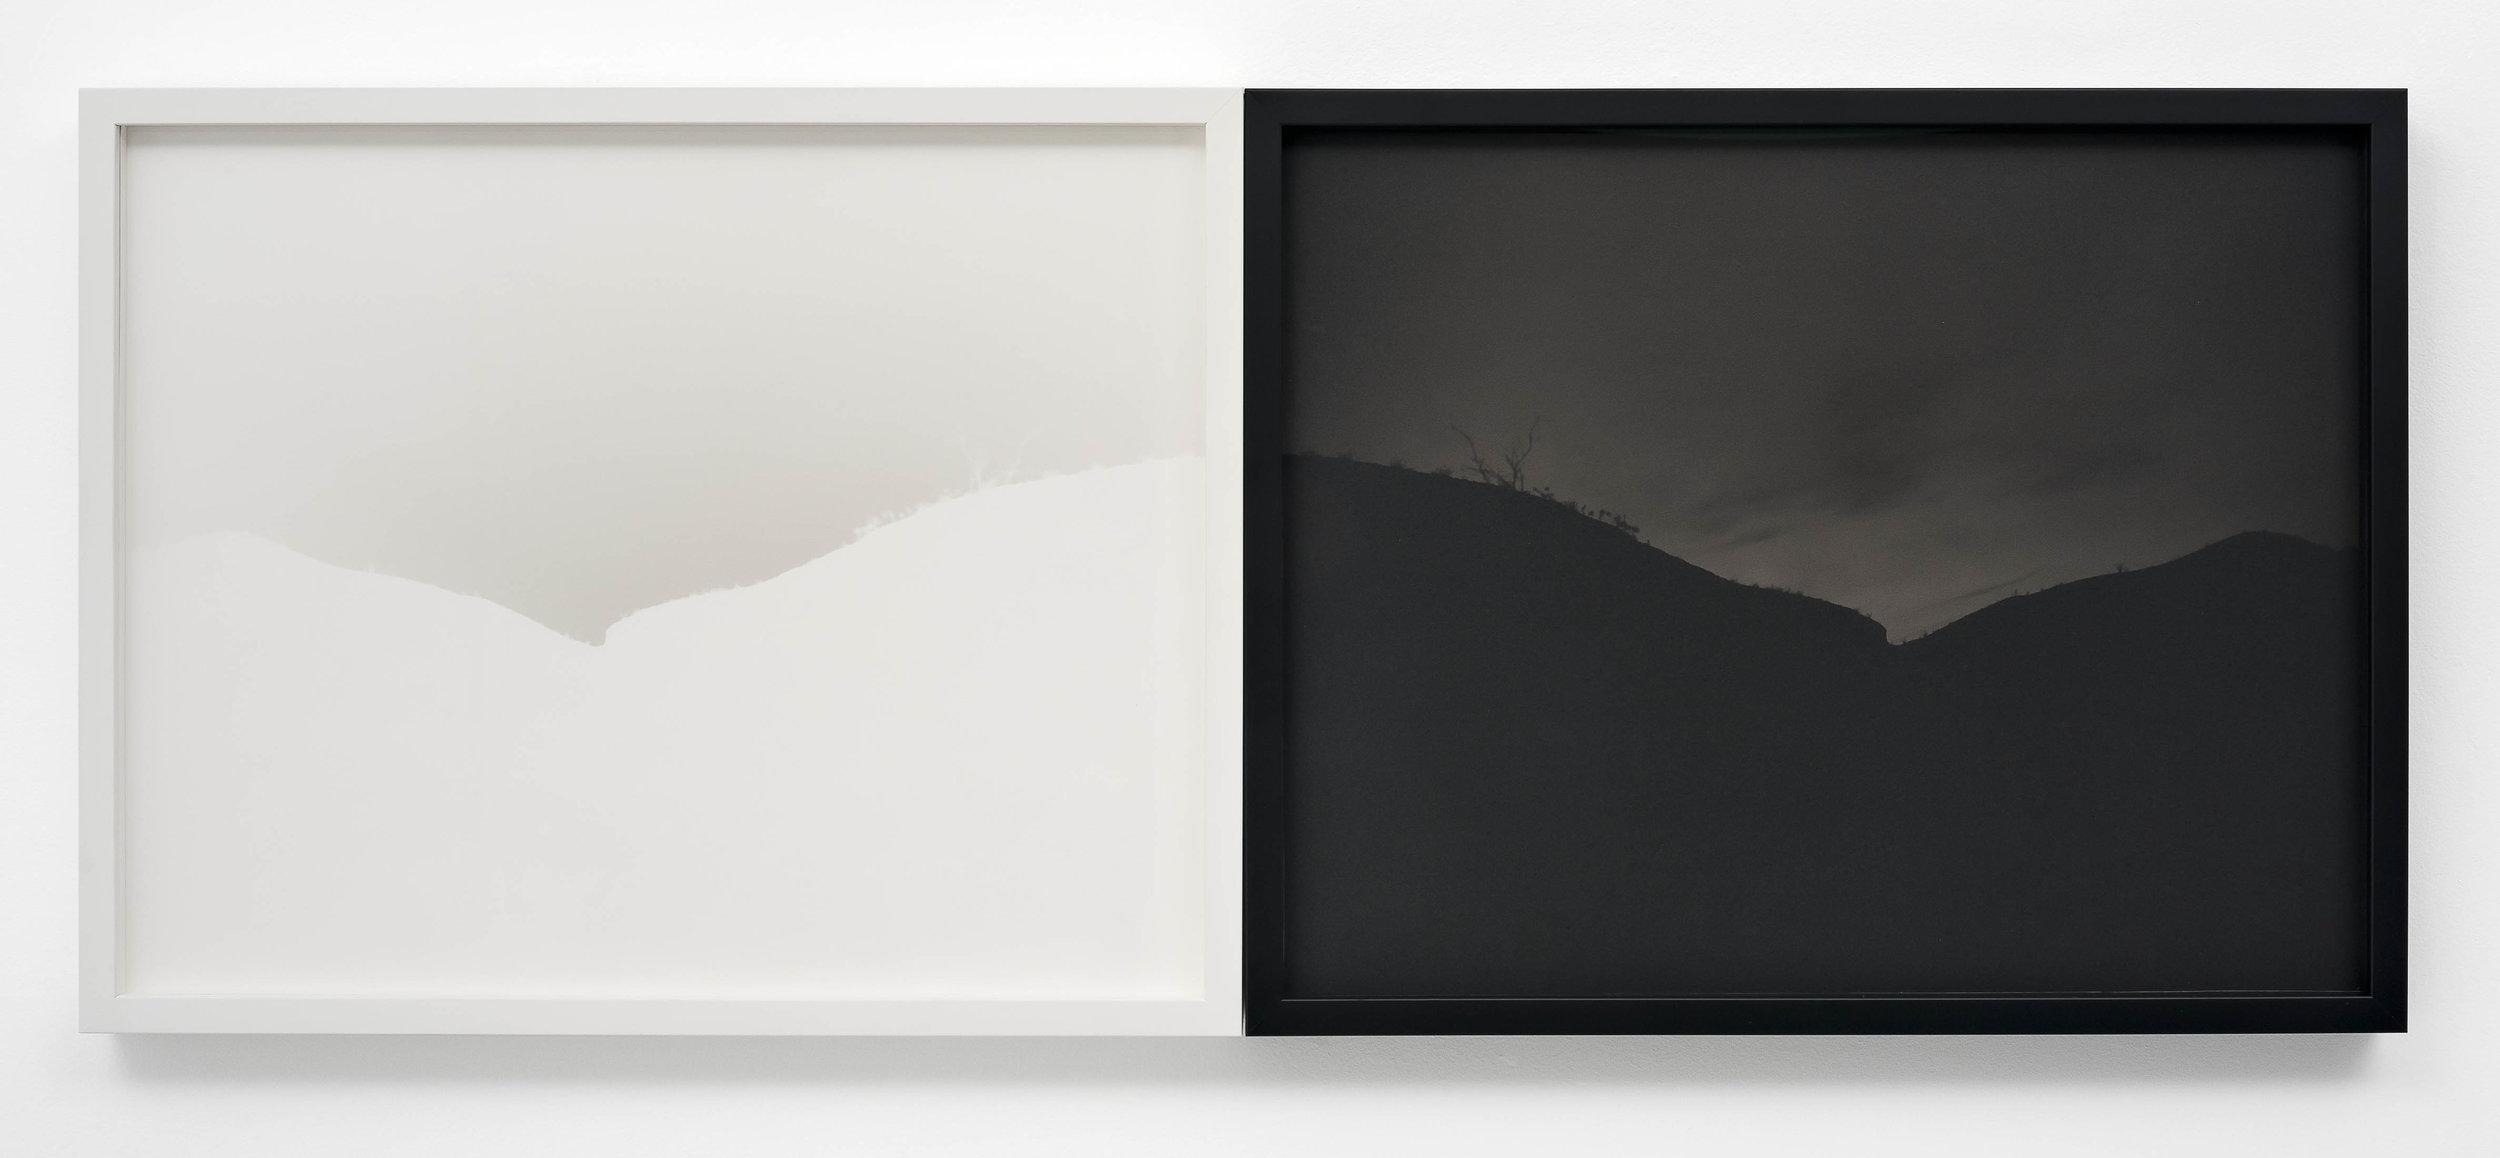 SCOTT B. DAVIS  Sandbar, Anza-Borrego Desert,  2018 Unique paper negative palladium prints, diptych 16 x 40 inches; frame: 17 x 42 inches